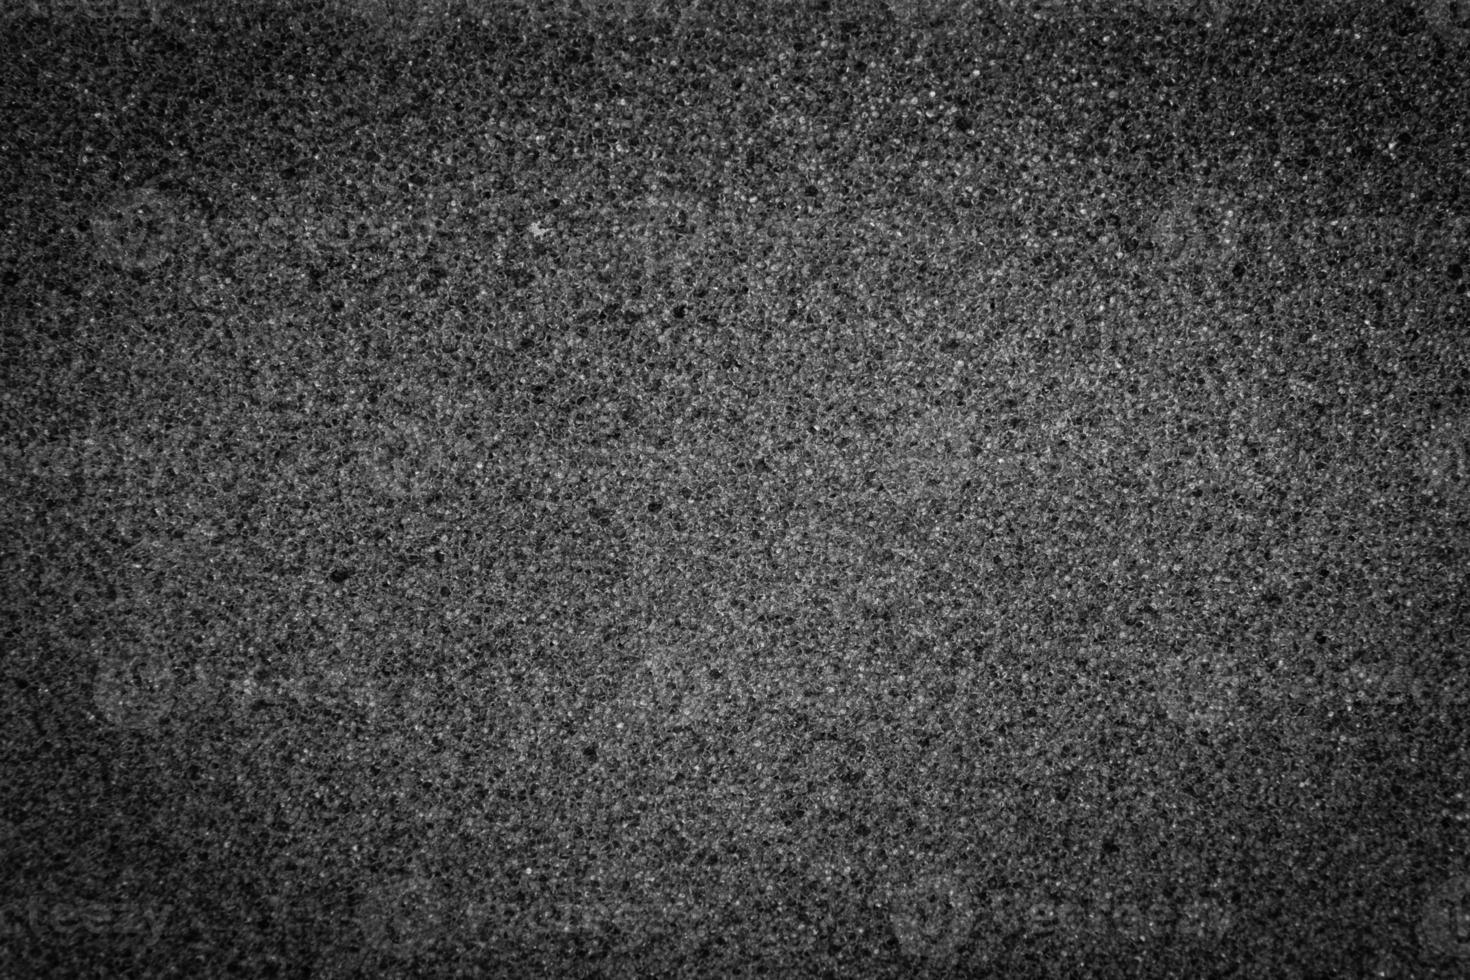 spons textuur foto